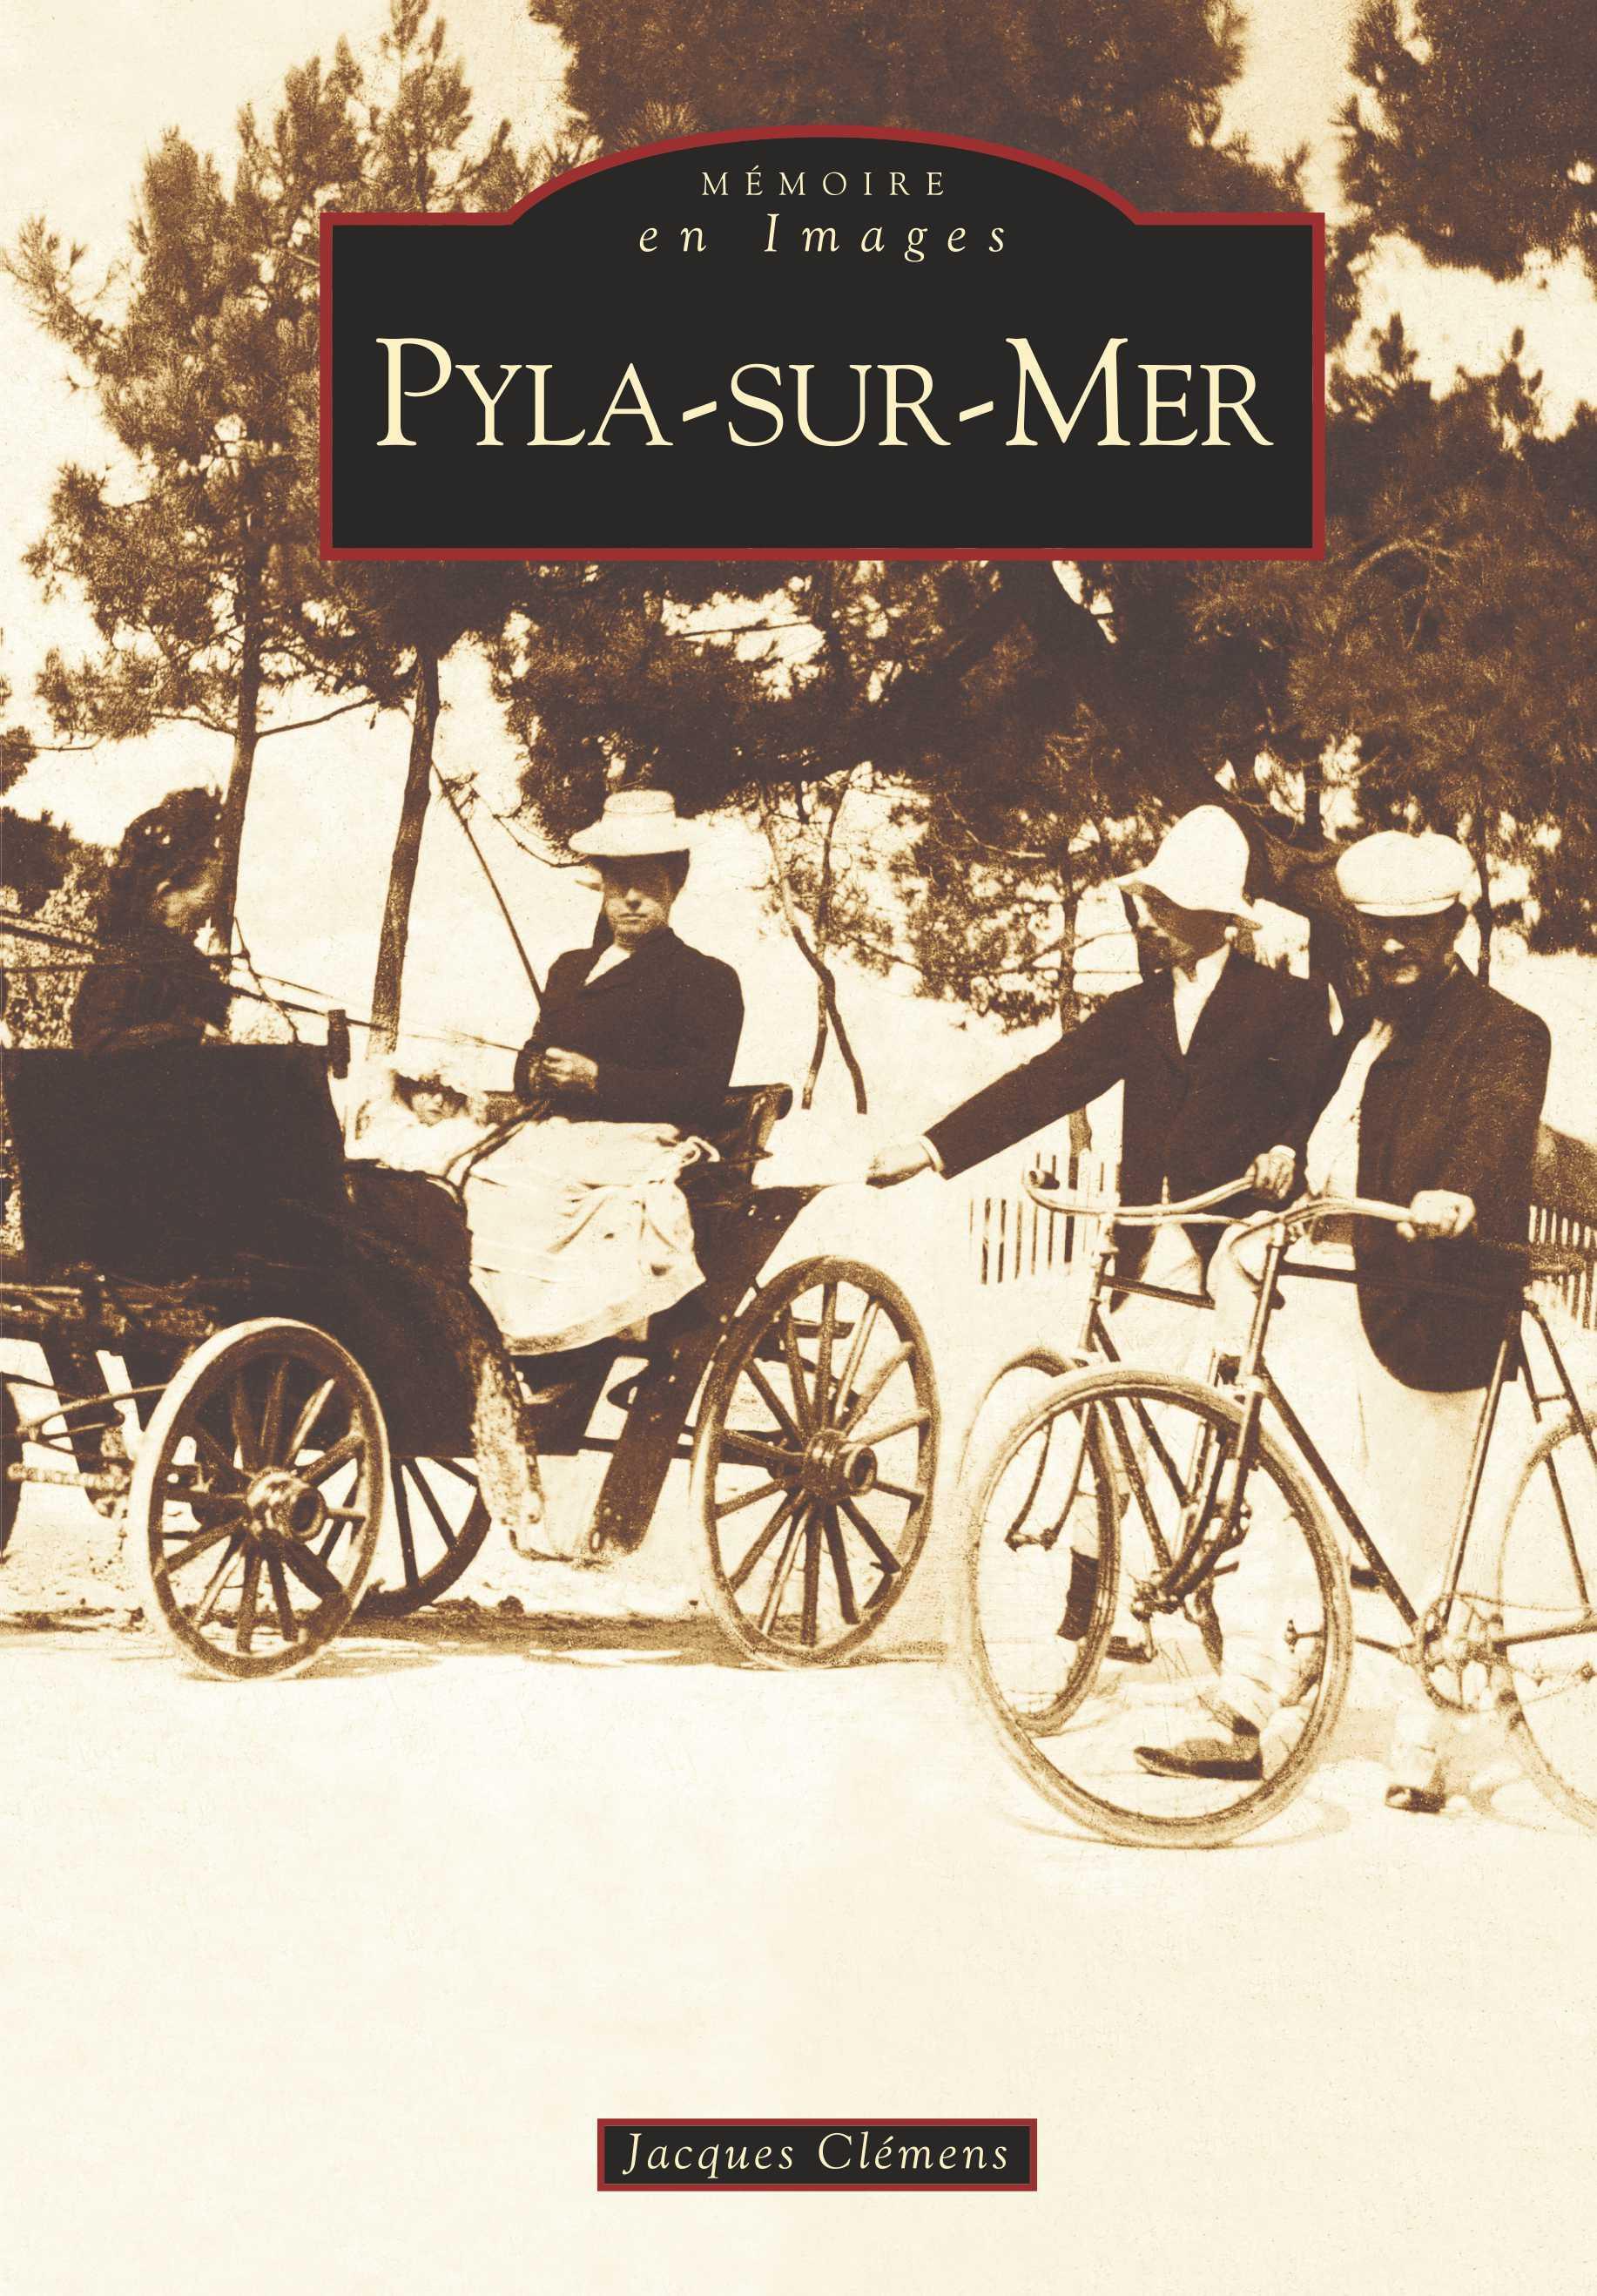 PYLA-SUR-MER